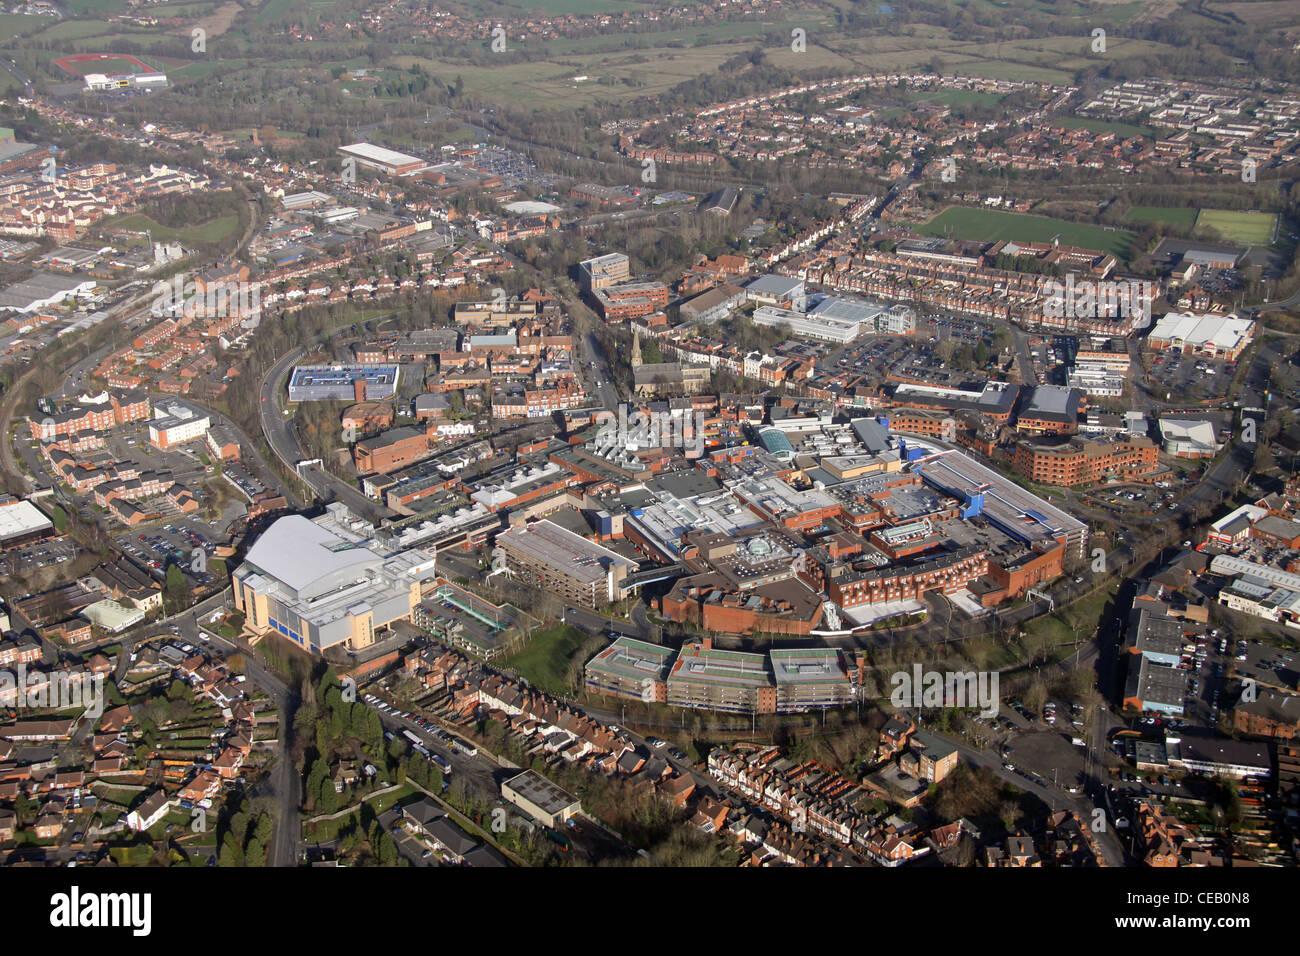 Aerial image of Redditch, West Midlands - Stock Image